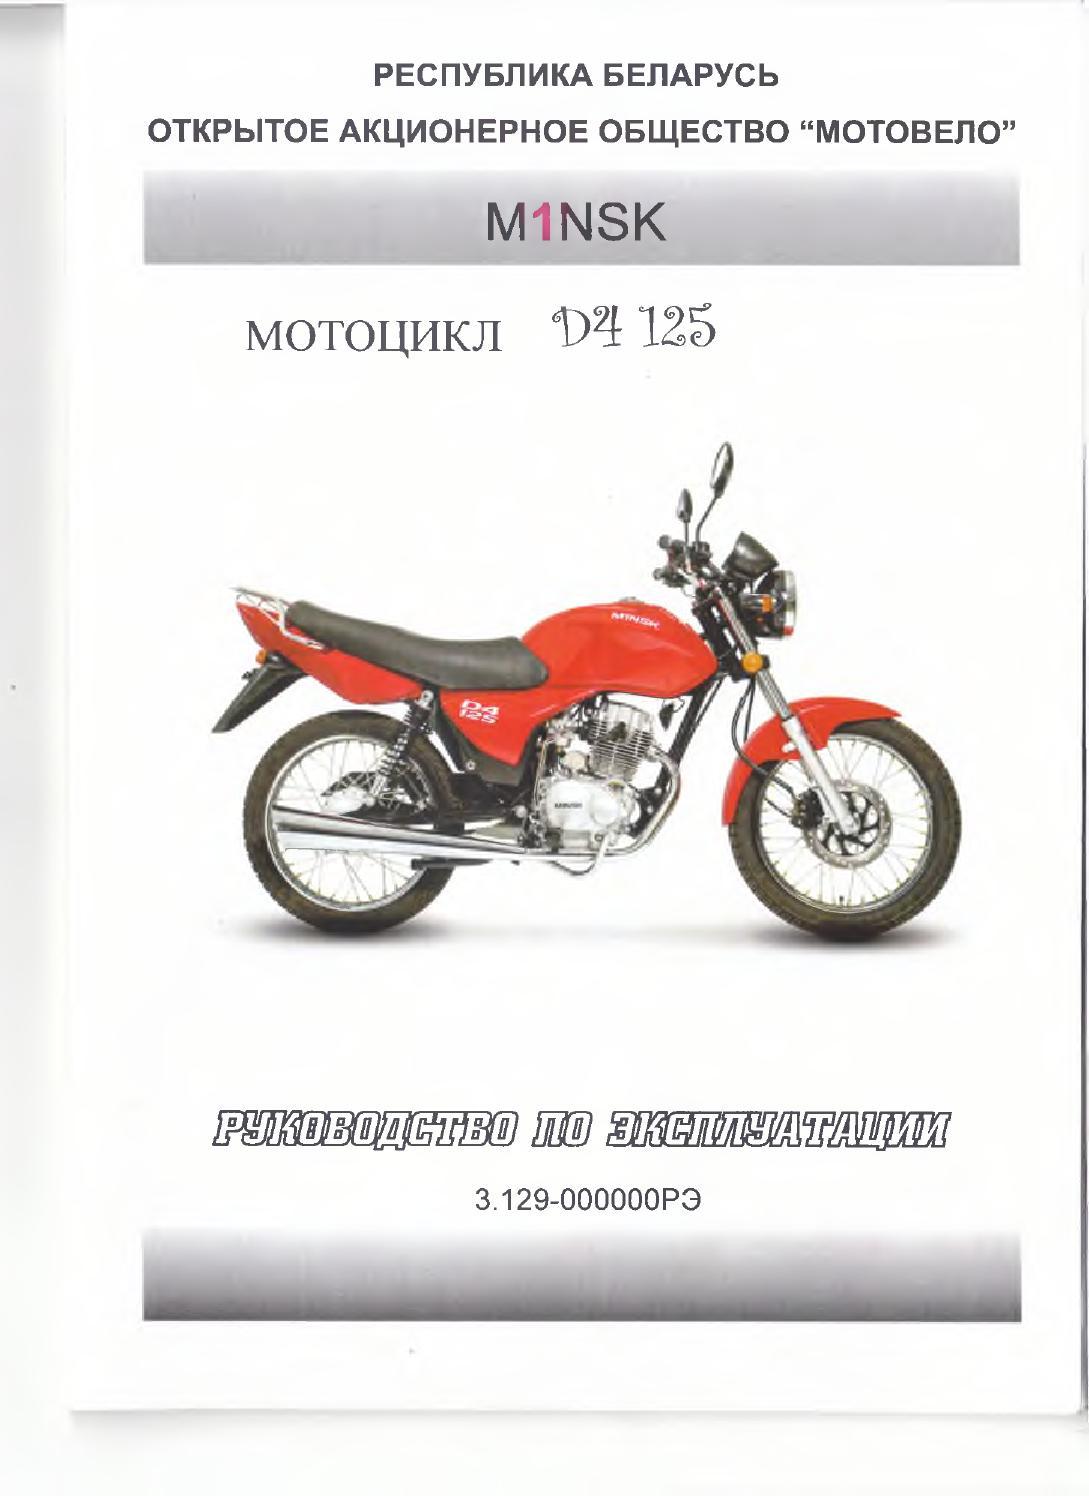 инструкция по эксплуатации мотоцикла минск